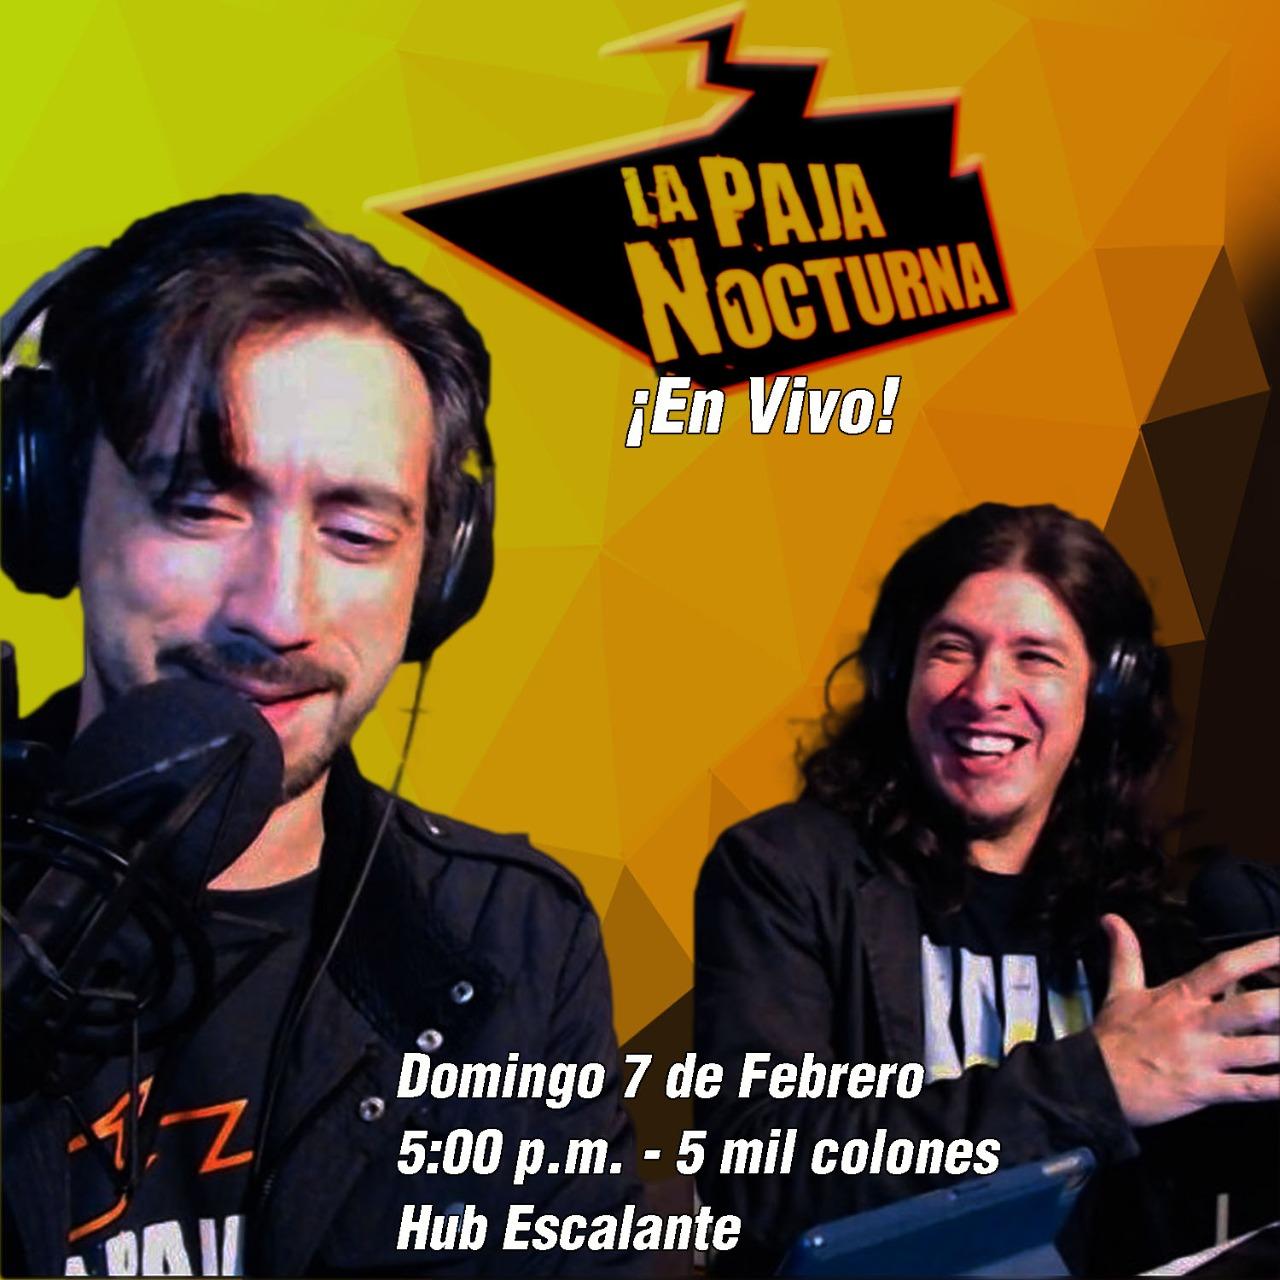 La Paja Nocturna regresa En Vivo 7 Febrero